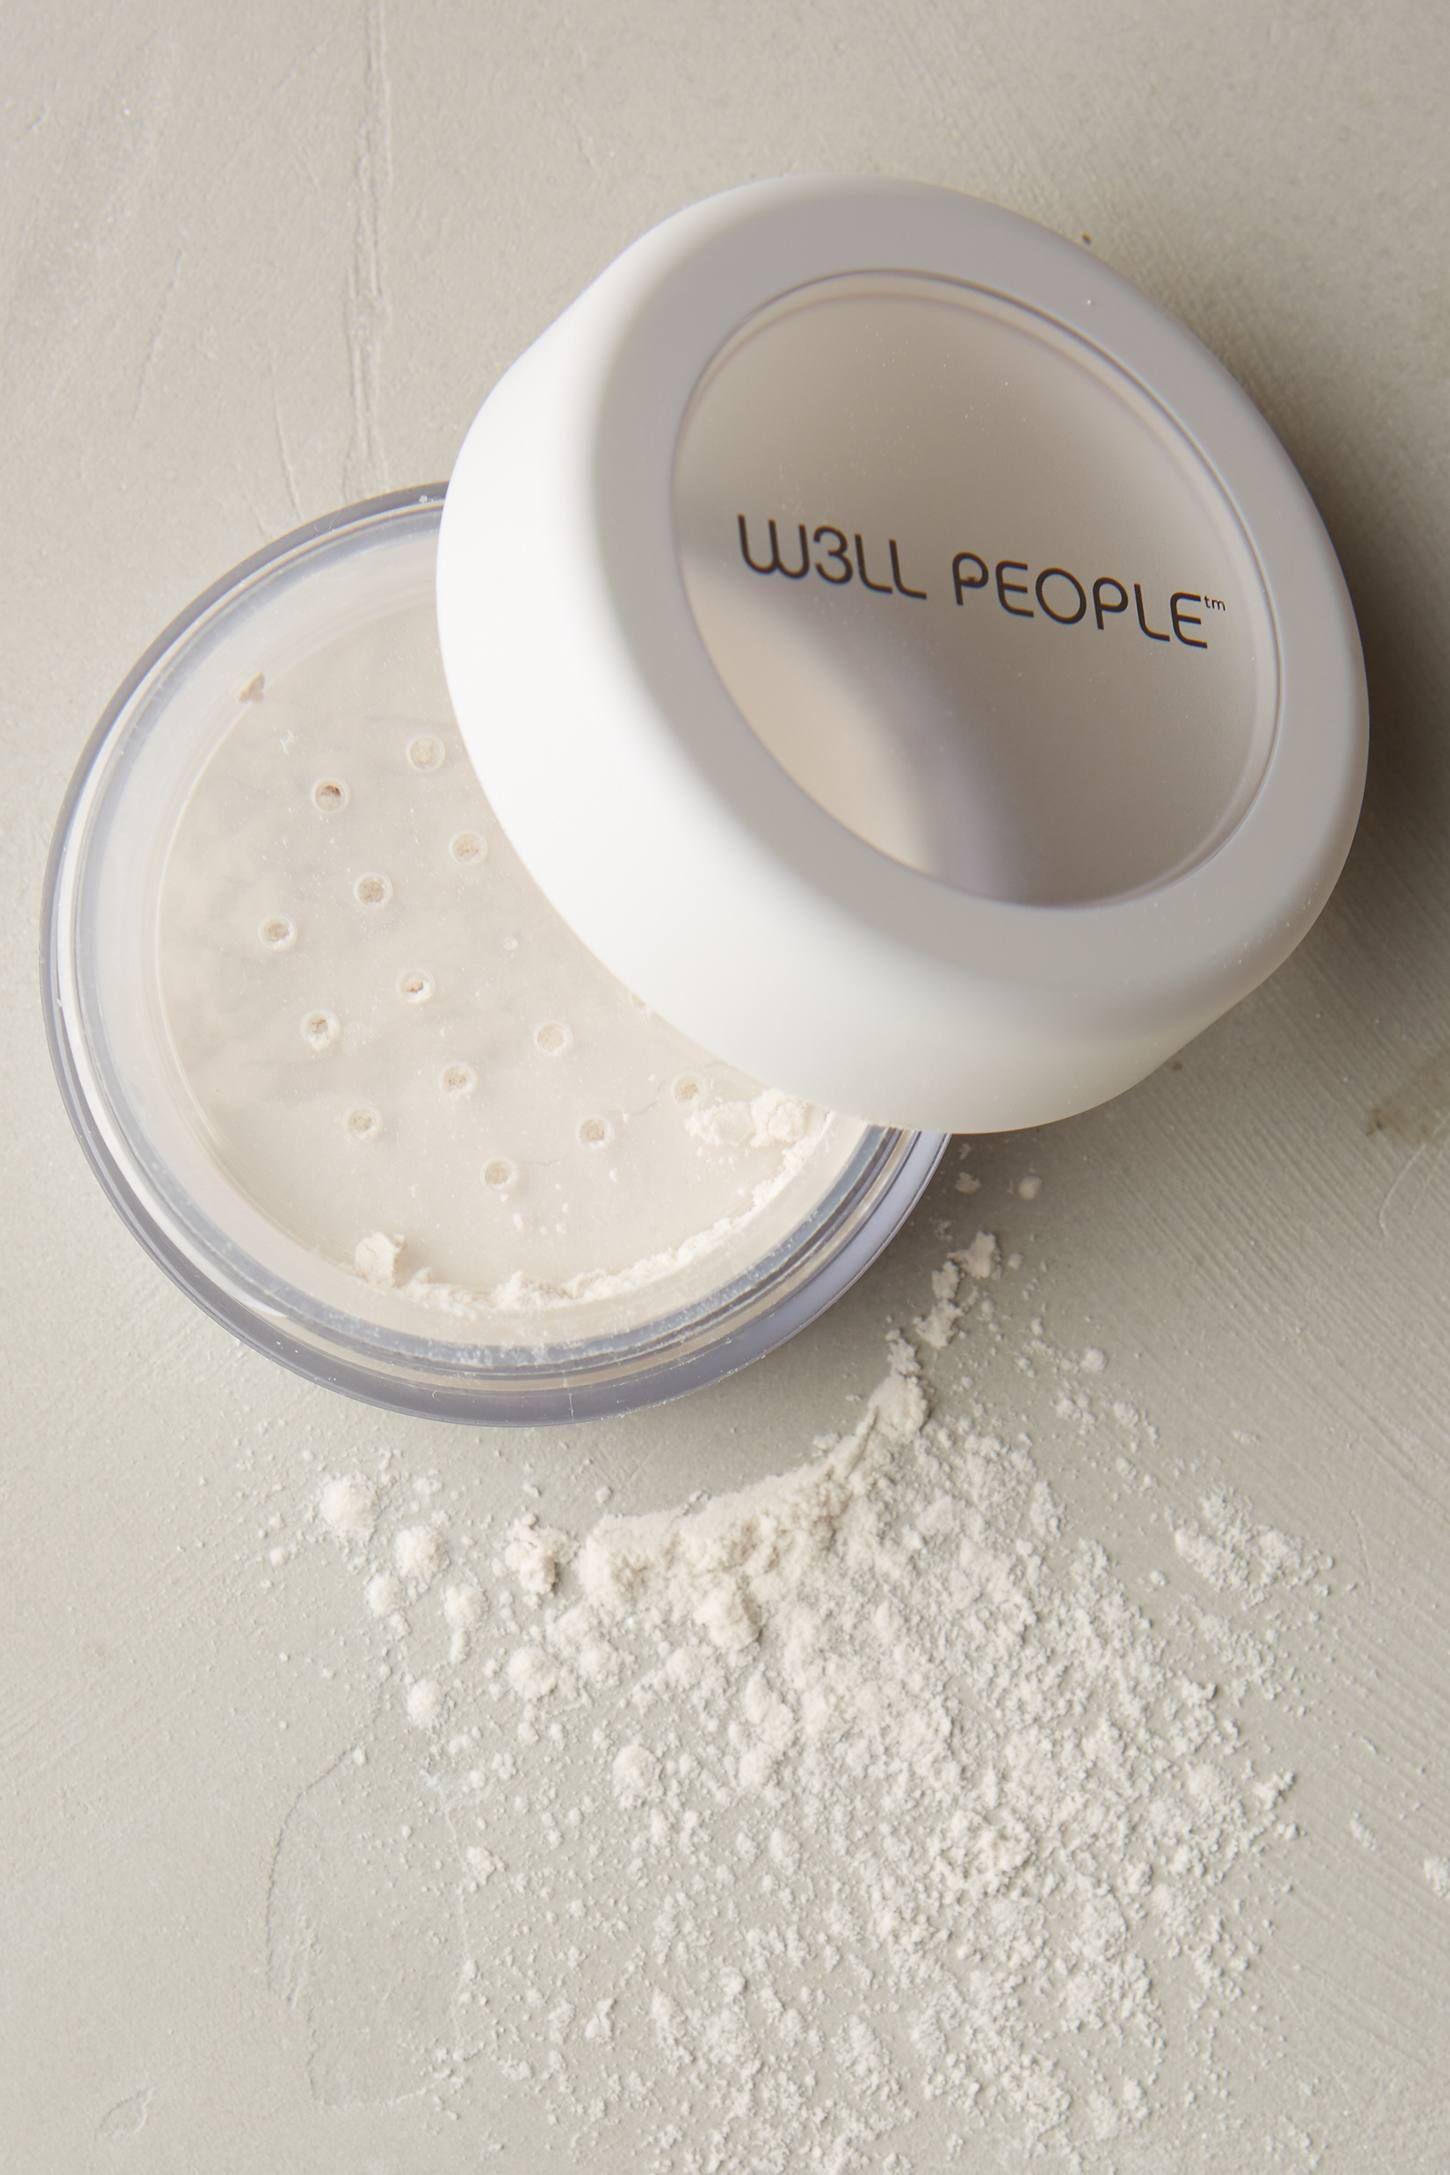 Bio Brightener Invisible Powder by w3ll people #13